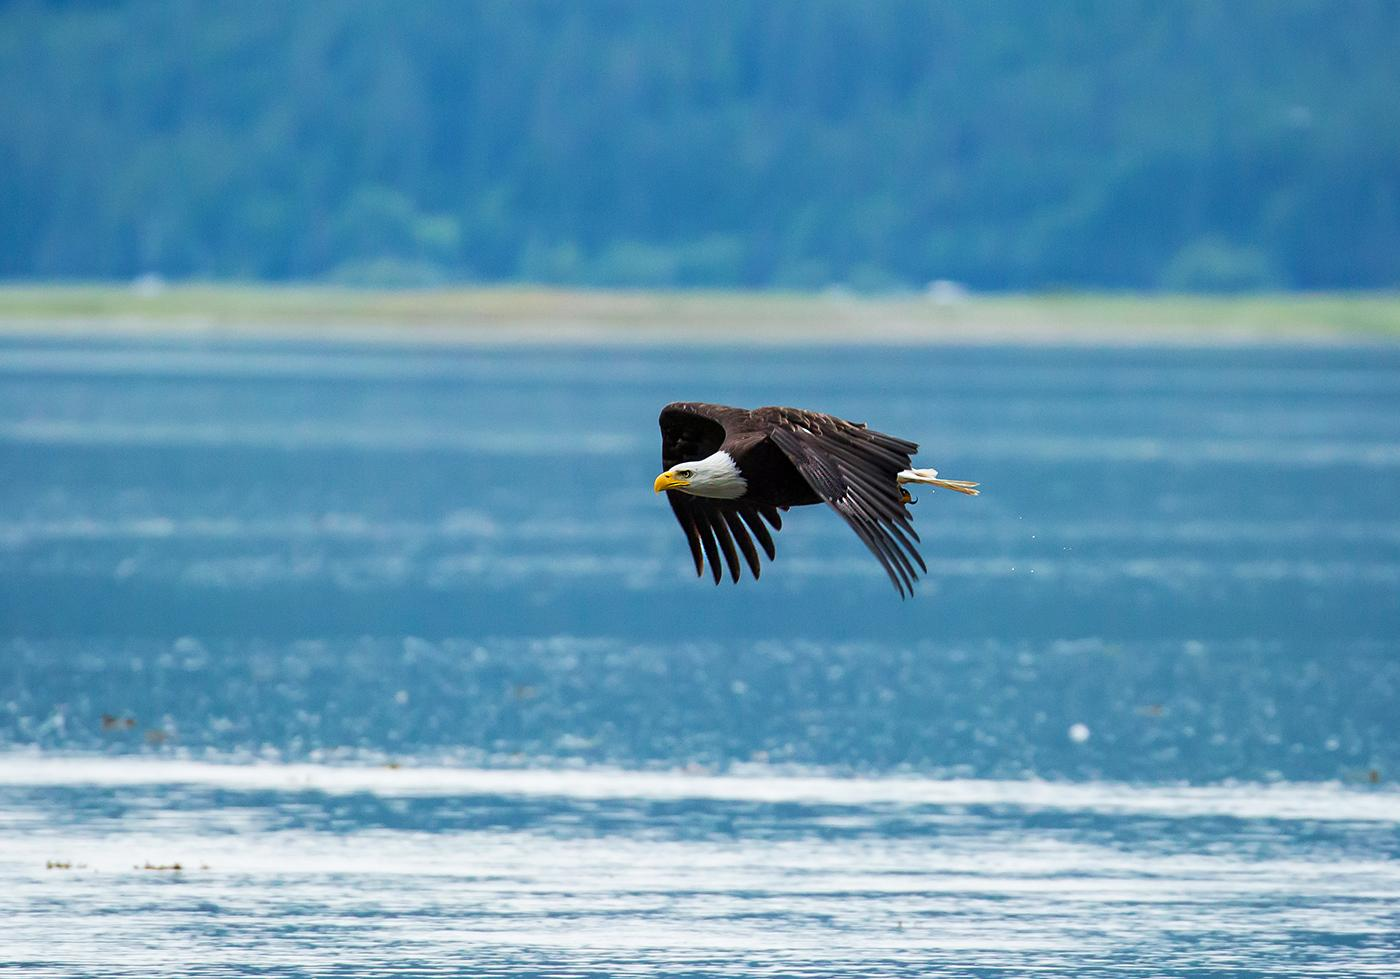 A bald eagle in flight in Alaska. Photo: Chris Kidd.